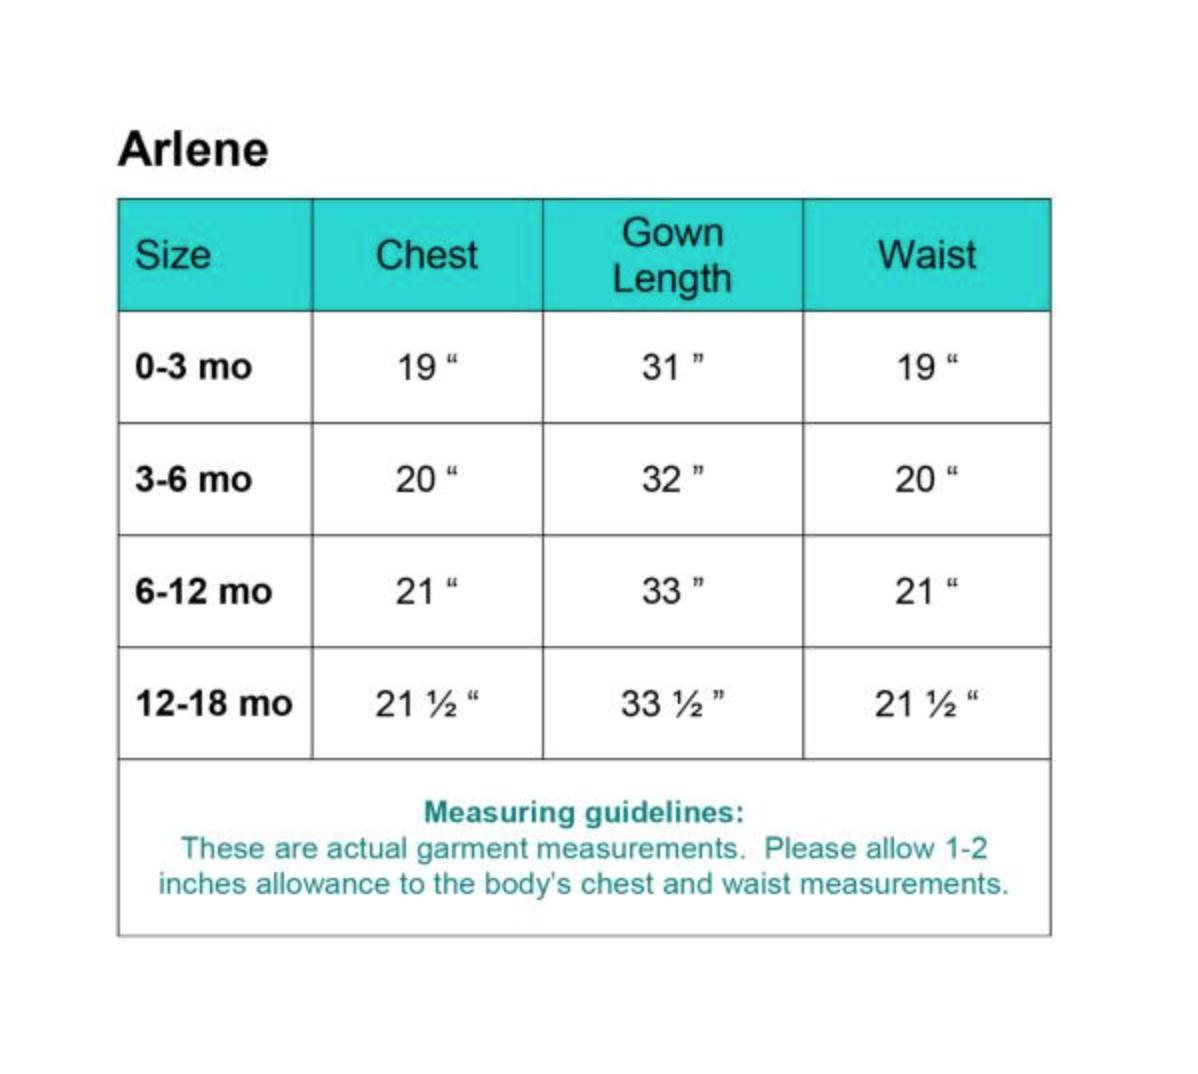 sizing-chart-arlene.png